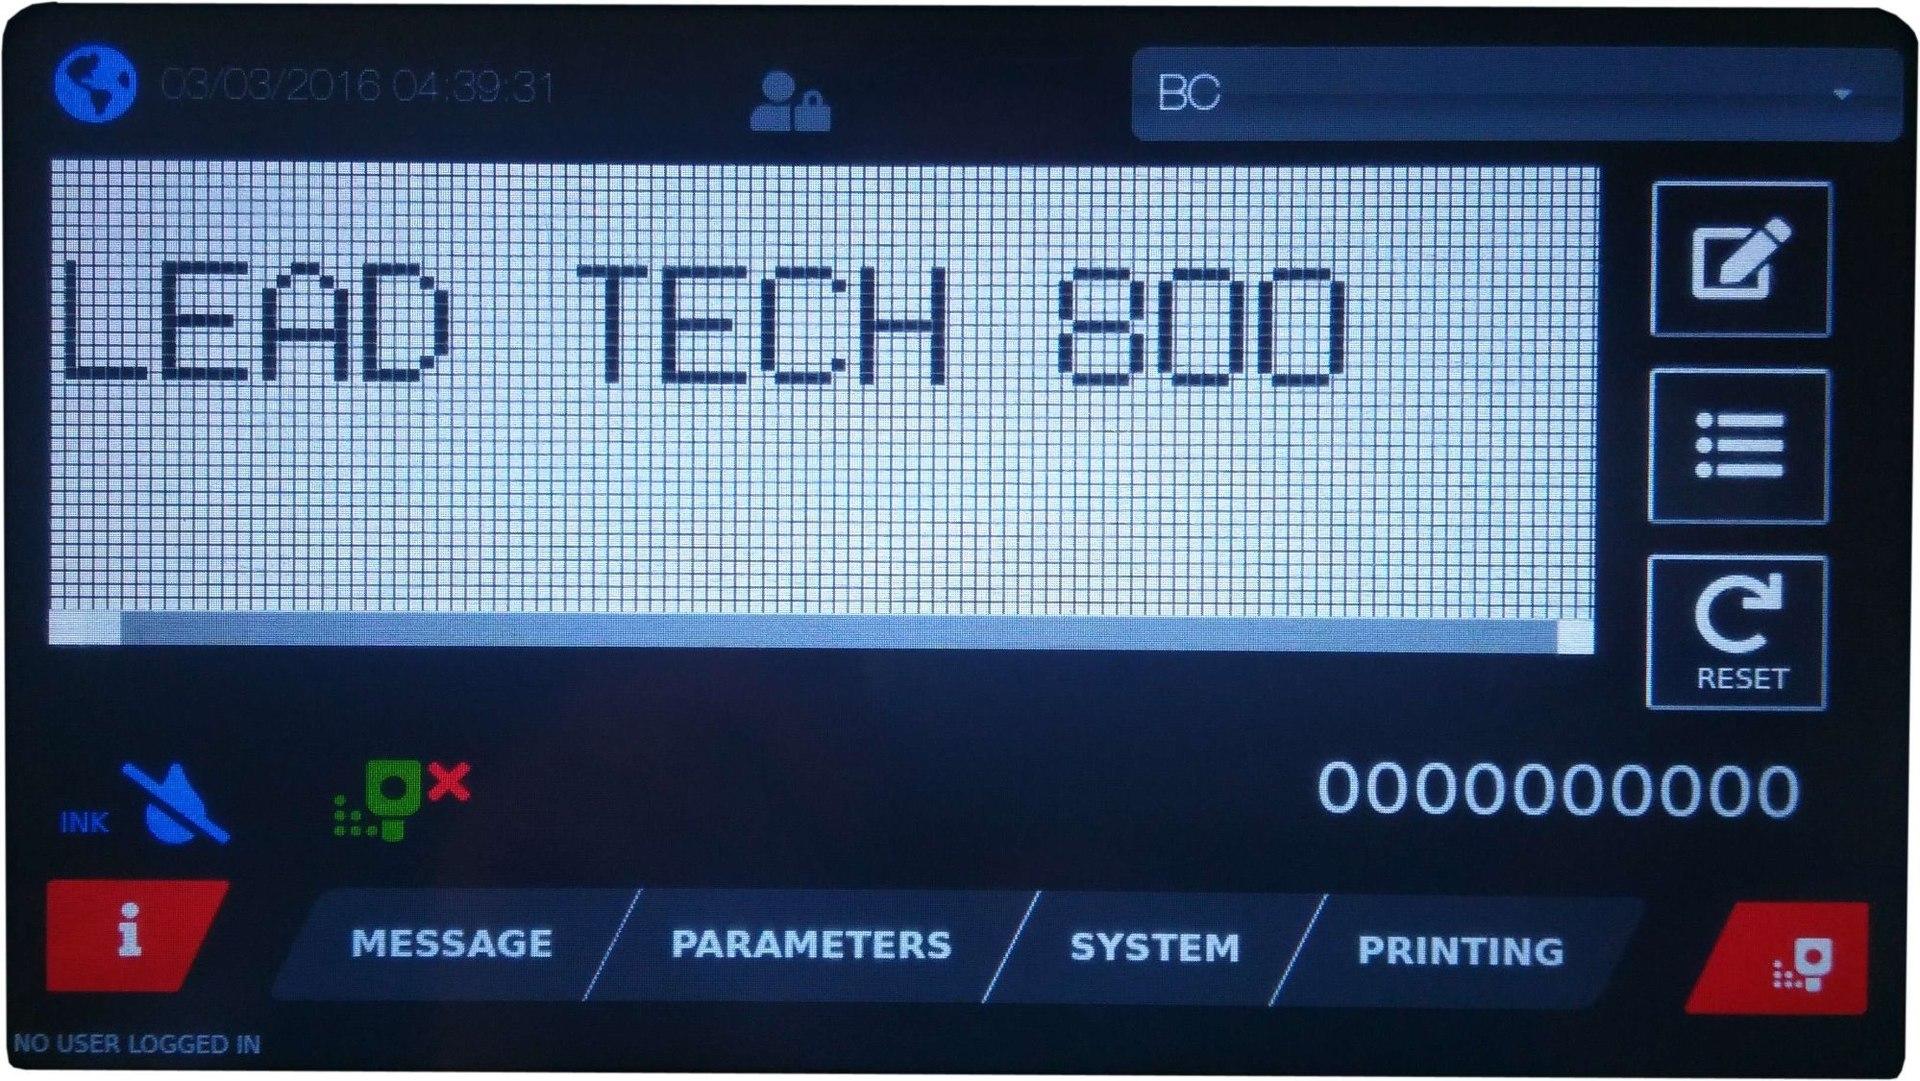 Lt800 Reverse Printing Cij Inkjet Printer